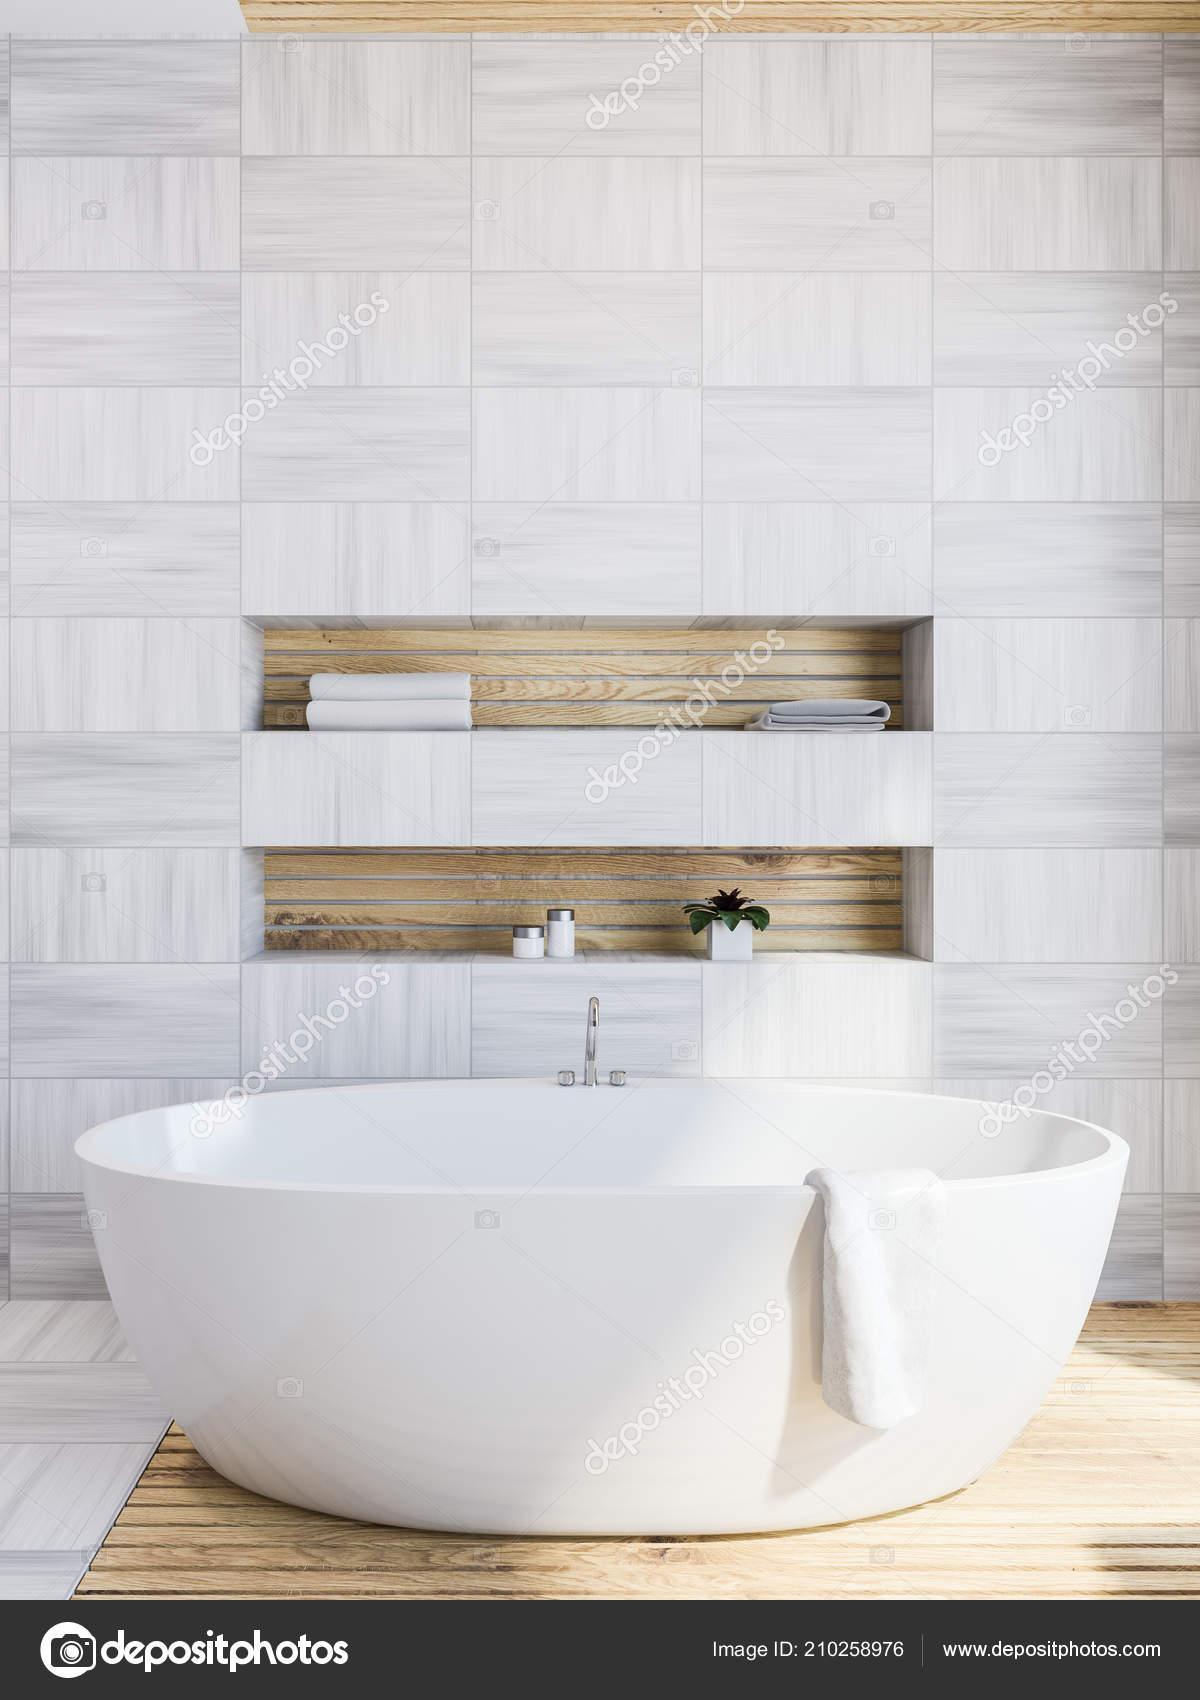 Bathroom Corner White Wooden Walls Floor Bathtub Shelves